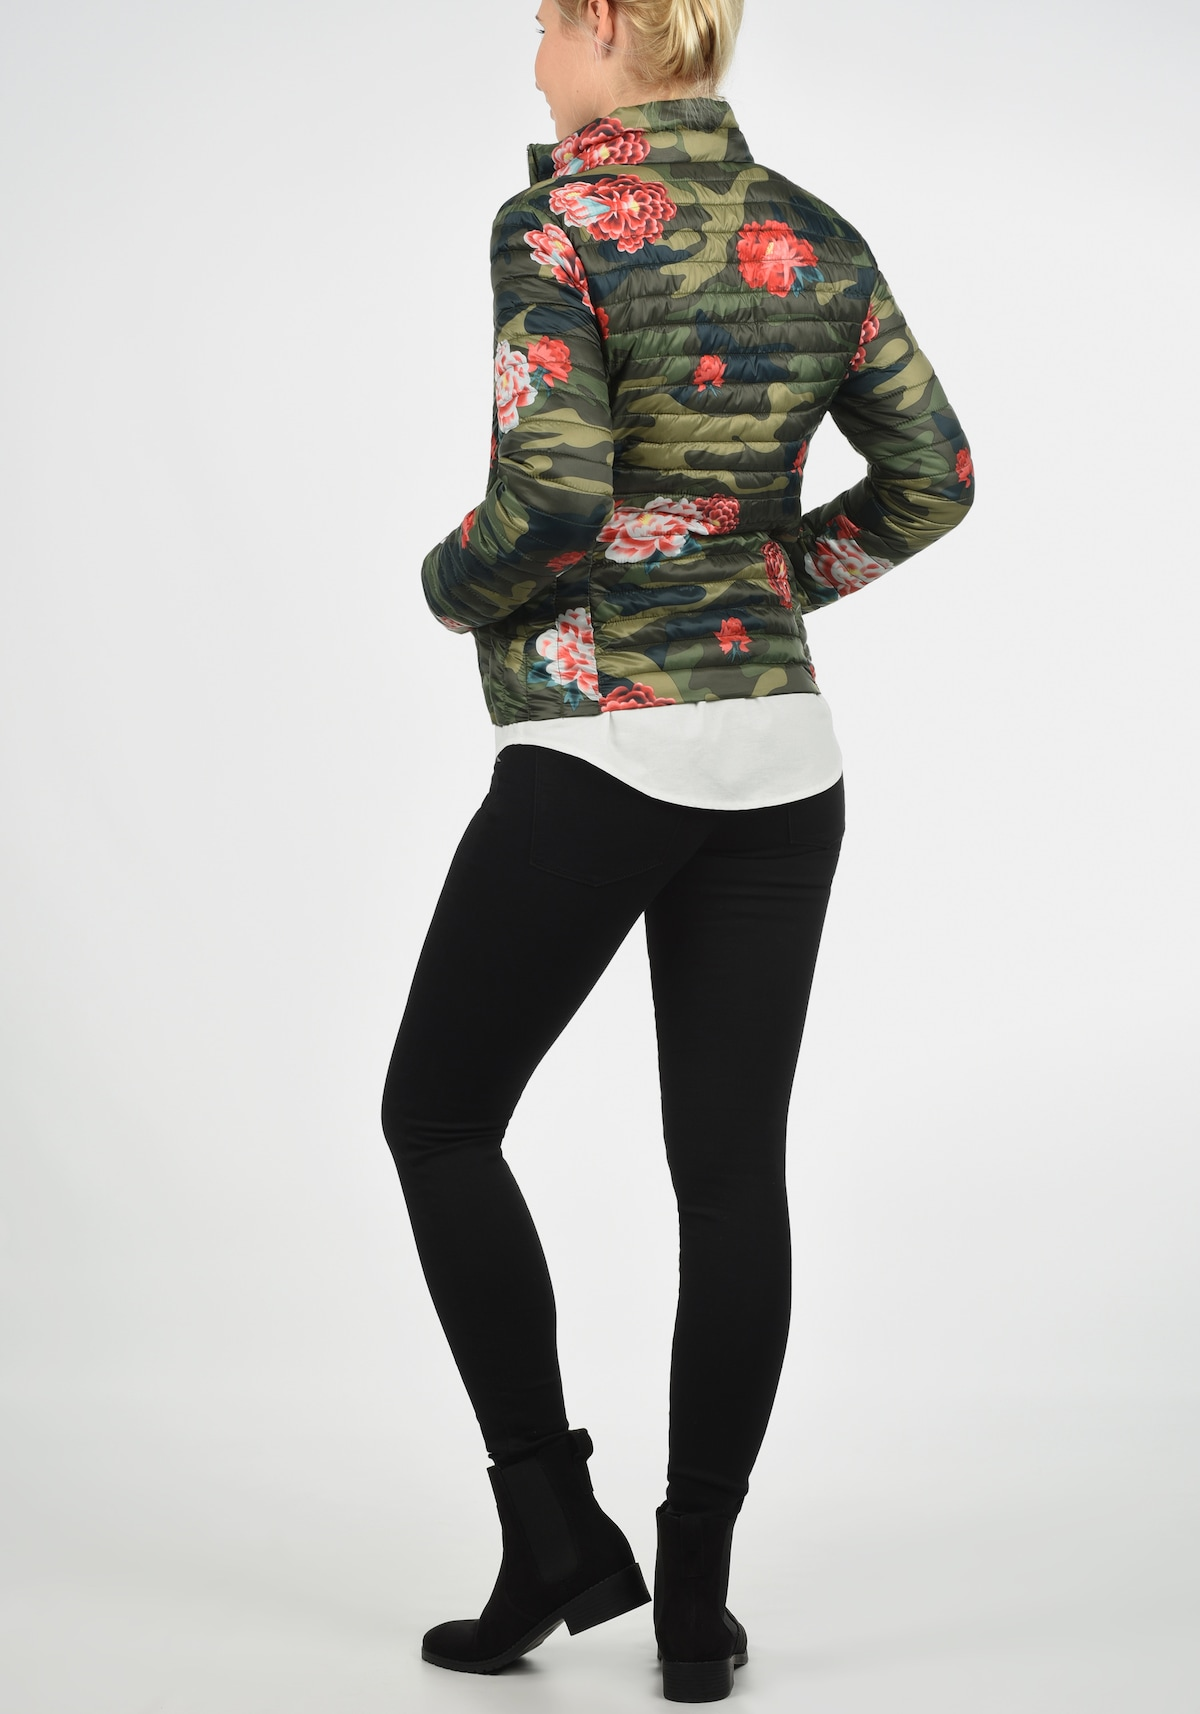 Beliebt Frauen Bekleidung JACQUELINE de YONG Steppjacke 'Britta' in grün Zum Verkauf